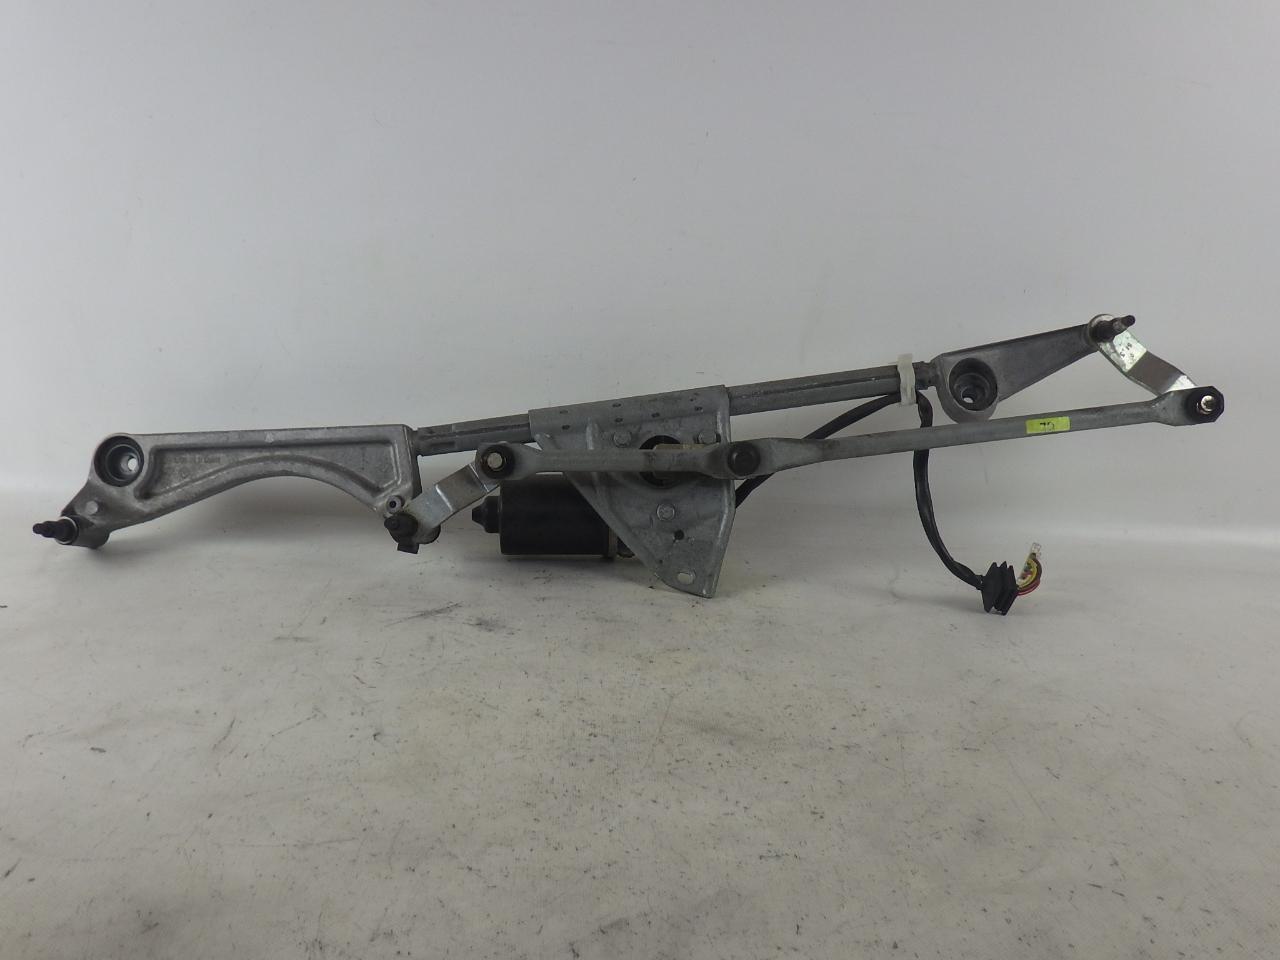 Details about A2038200342 Wiper Motor Wiper Motor Front Mercedes-Benz  C-Class Sports